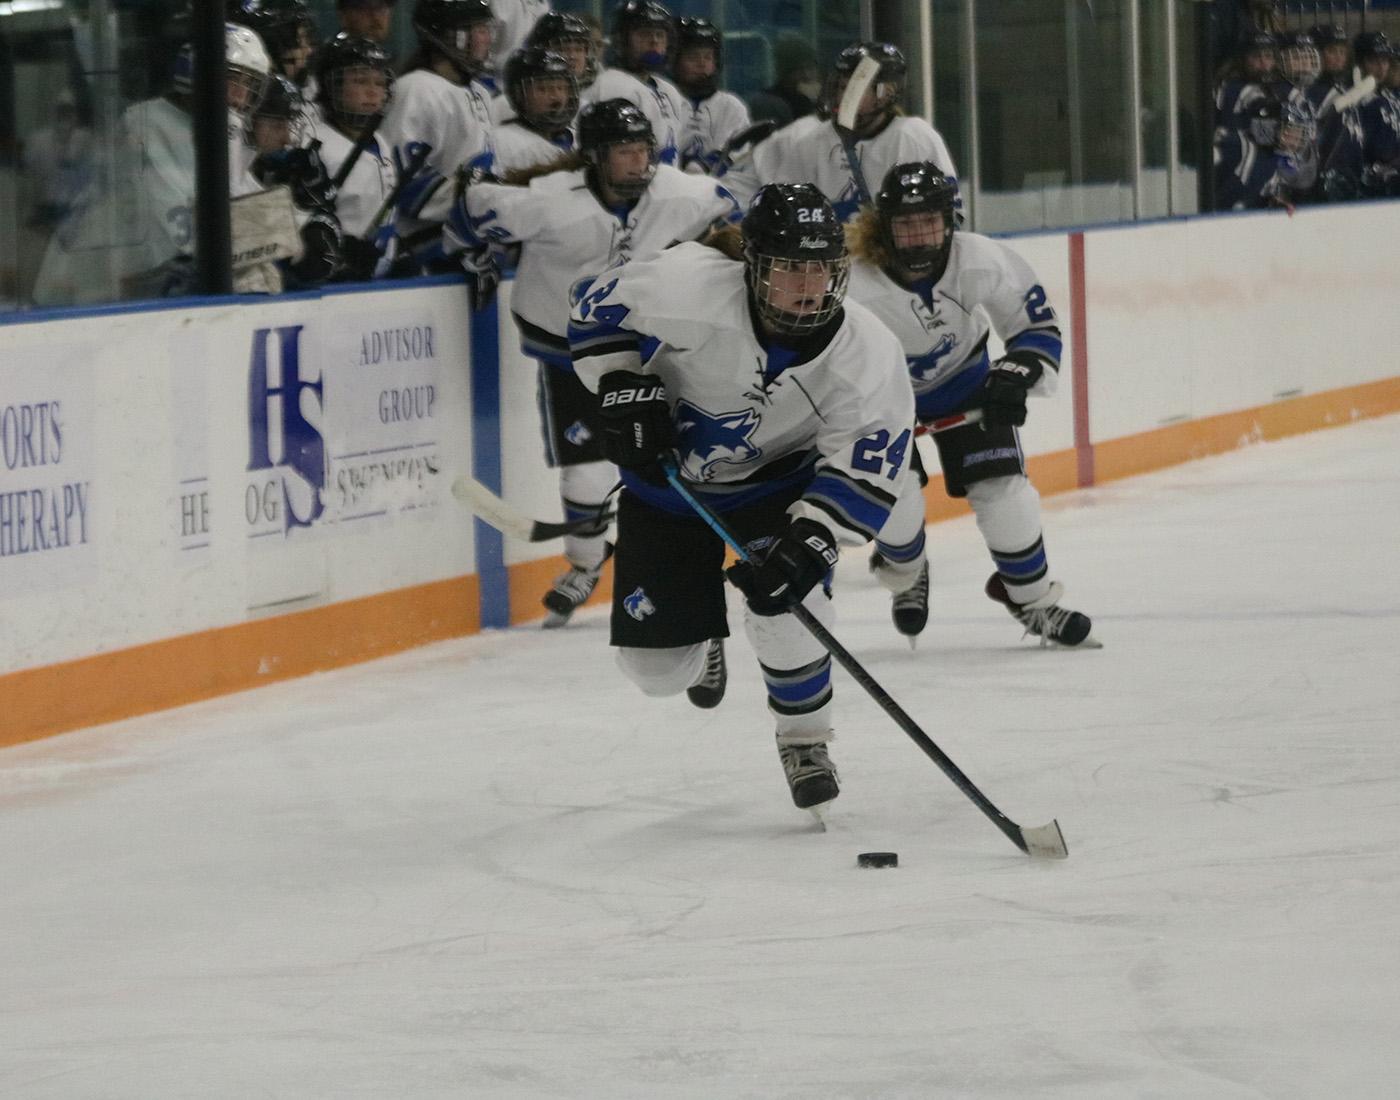 Freshman Abby Vetsch skates down the ice